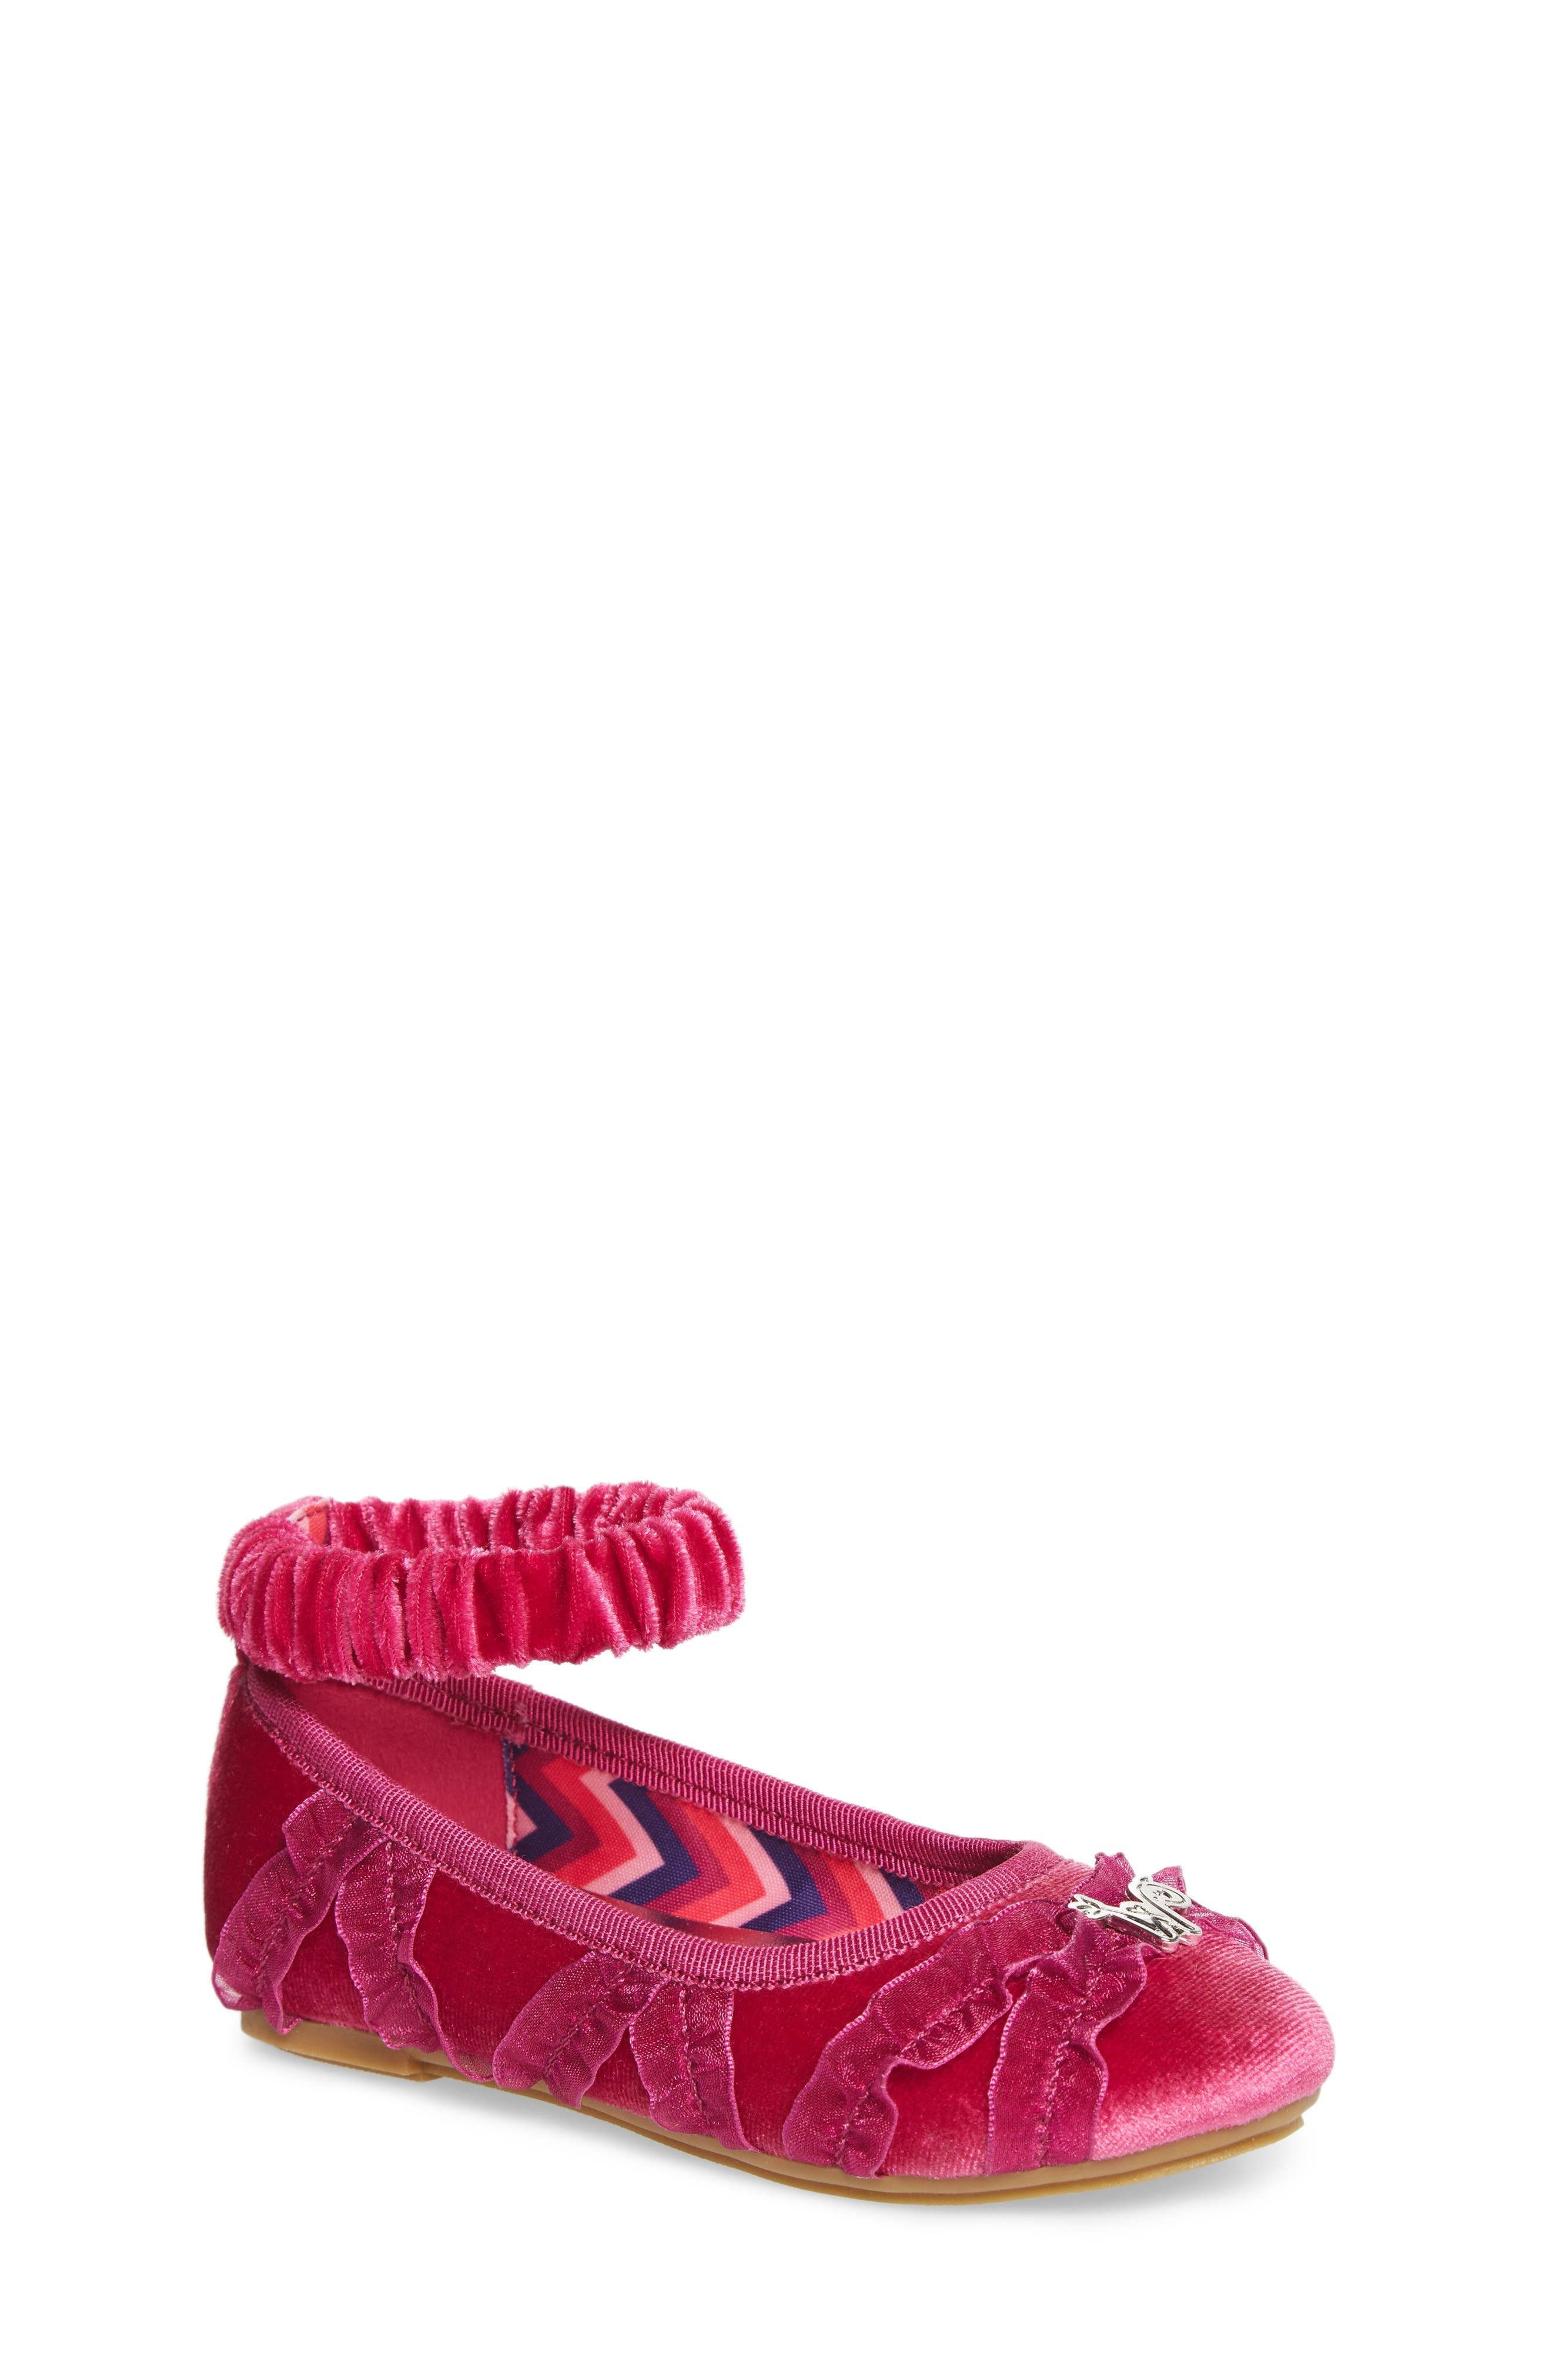 Emerson Ankle Strap Ballet Flat,                         Main,                         color,